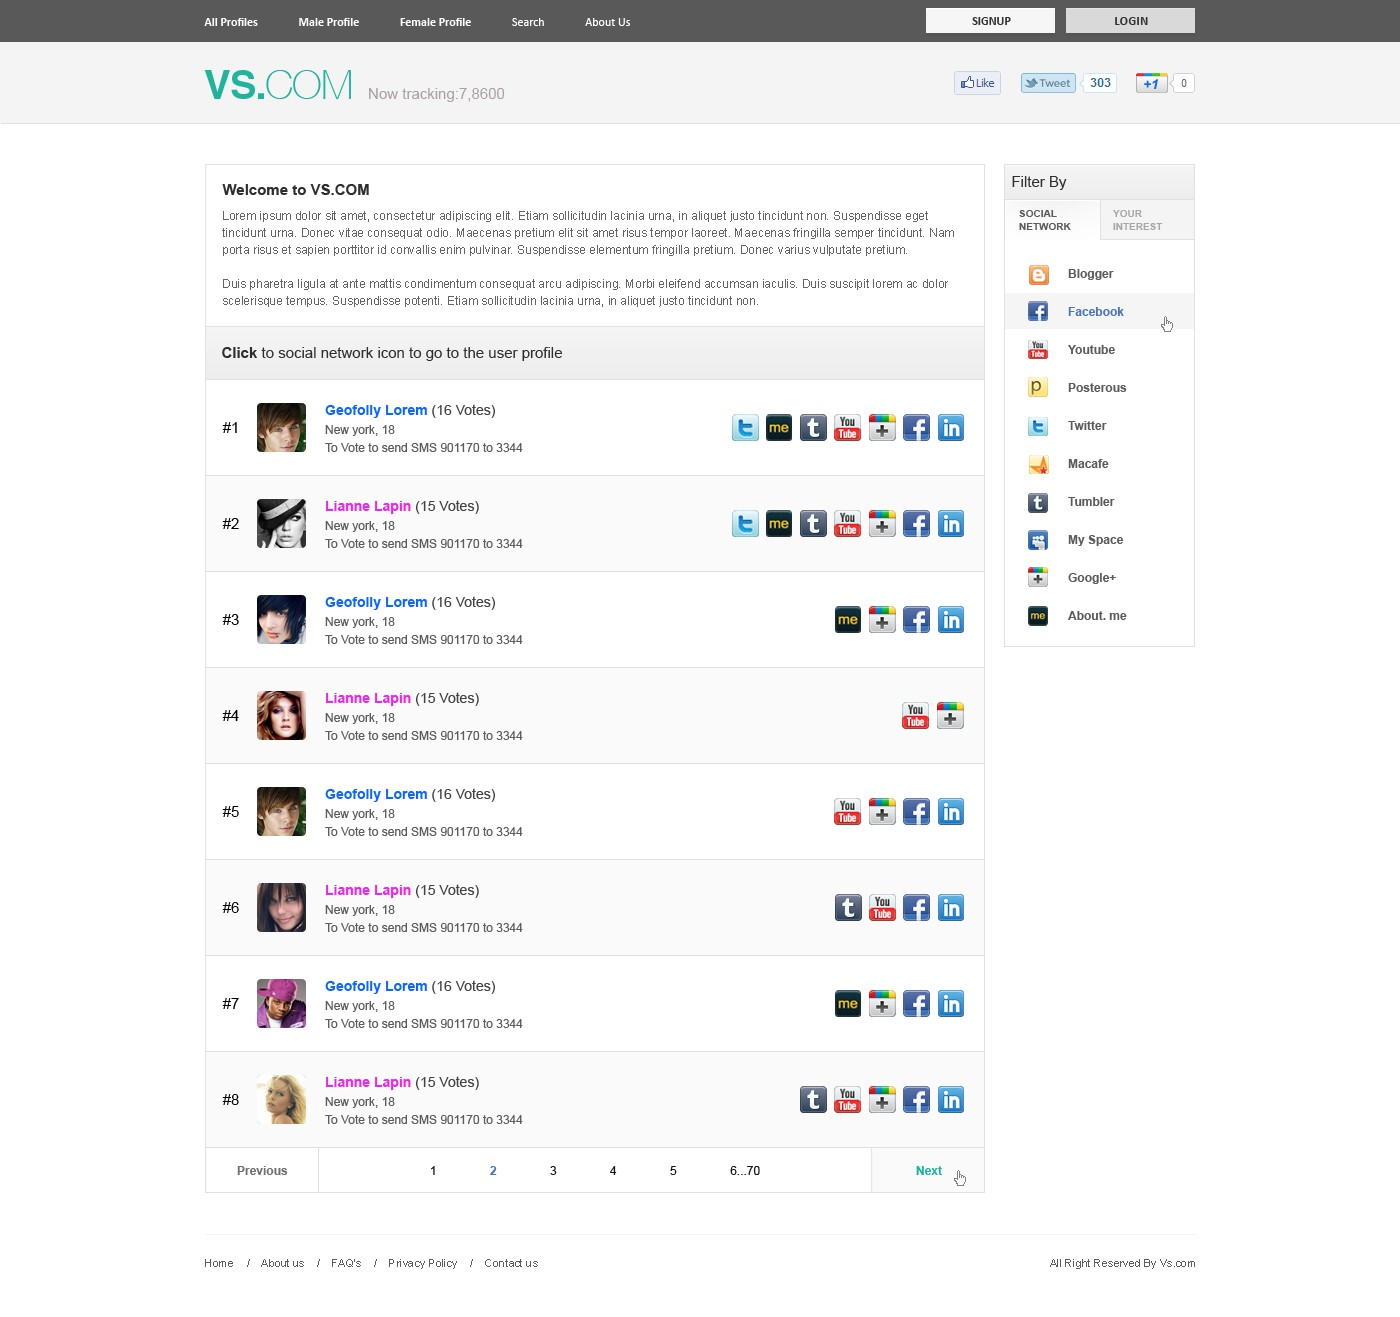 website design for Top ranking profiles